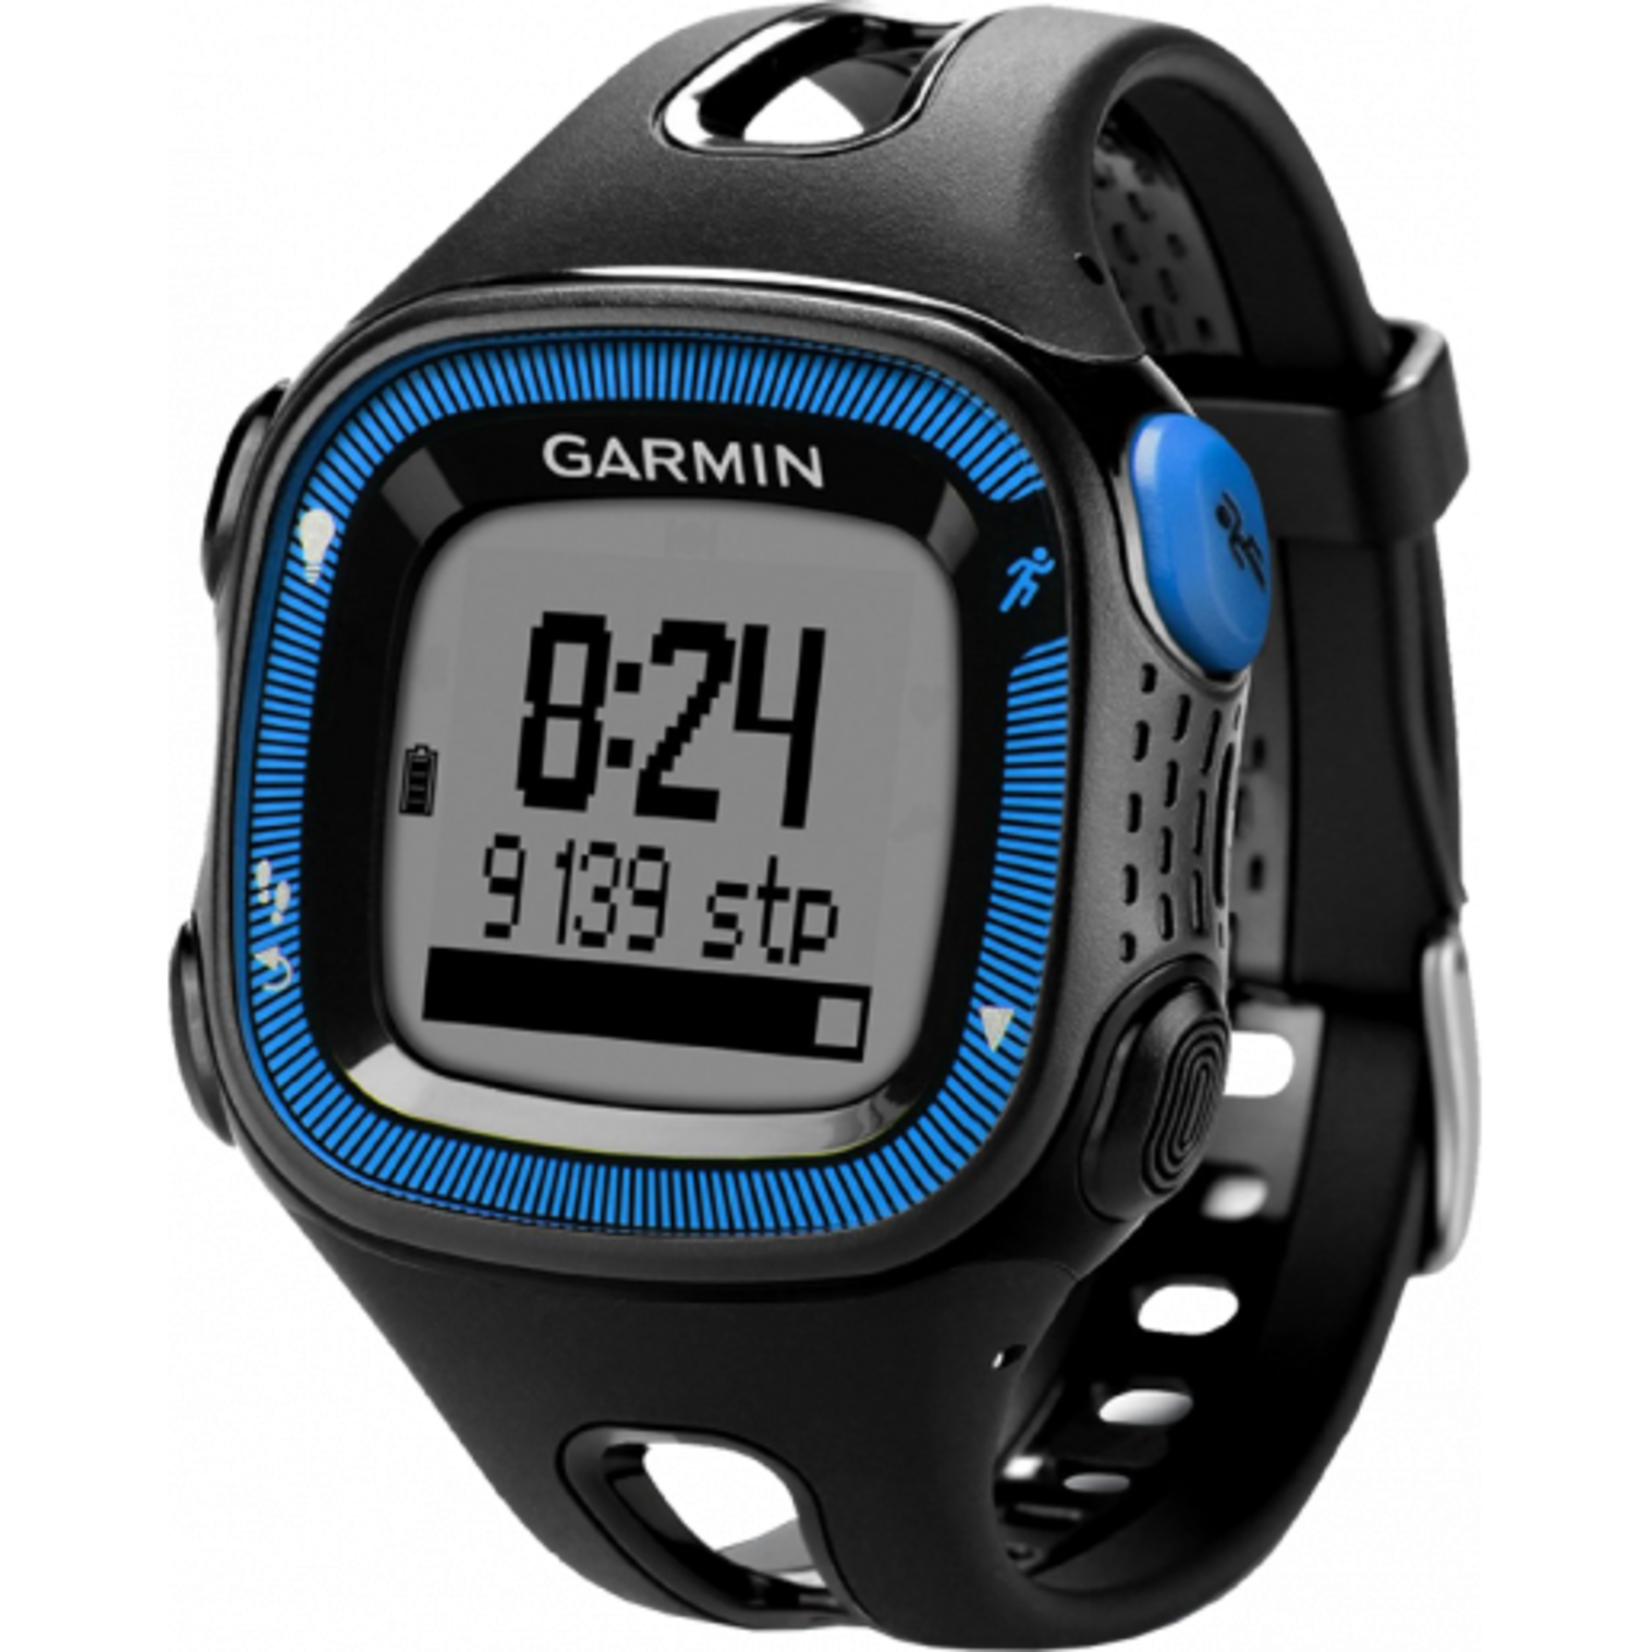 -Garmin Forerunner 15 GPS Running Watch with Heart Rate *Open box, like new